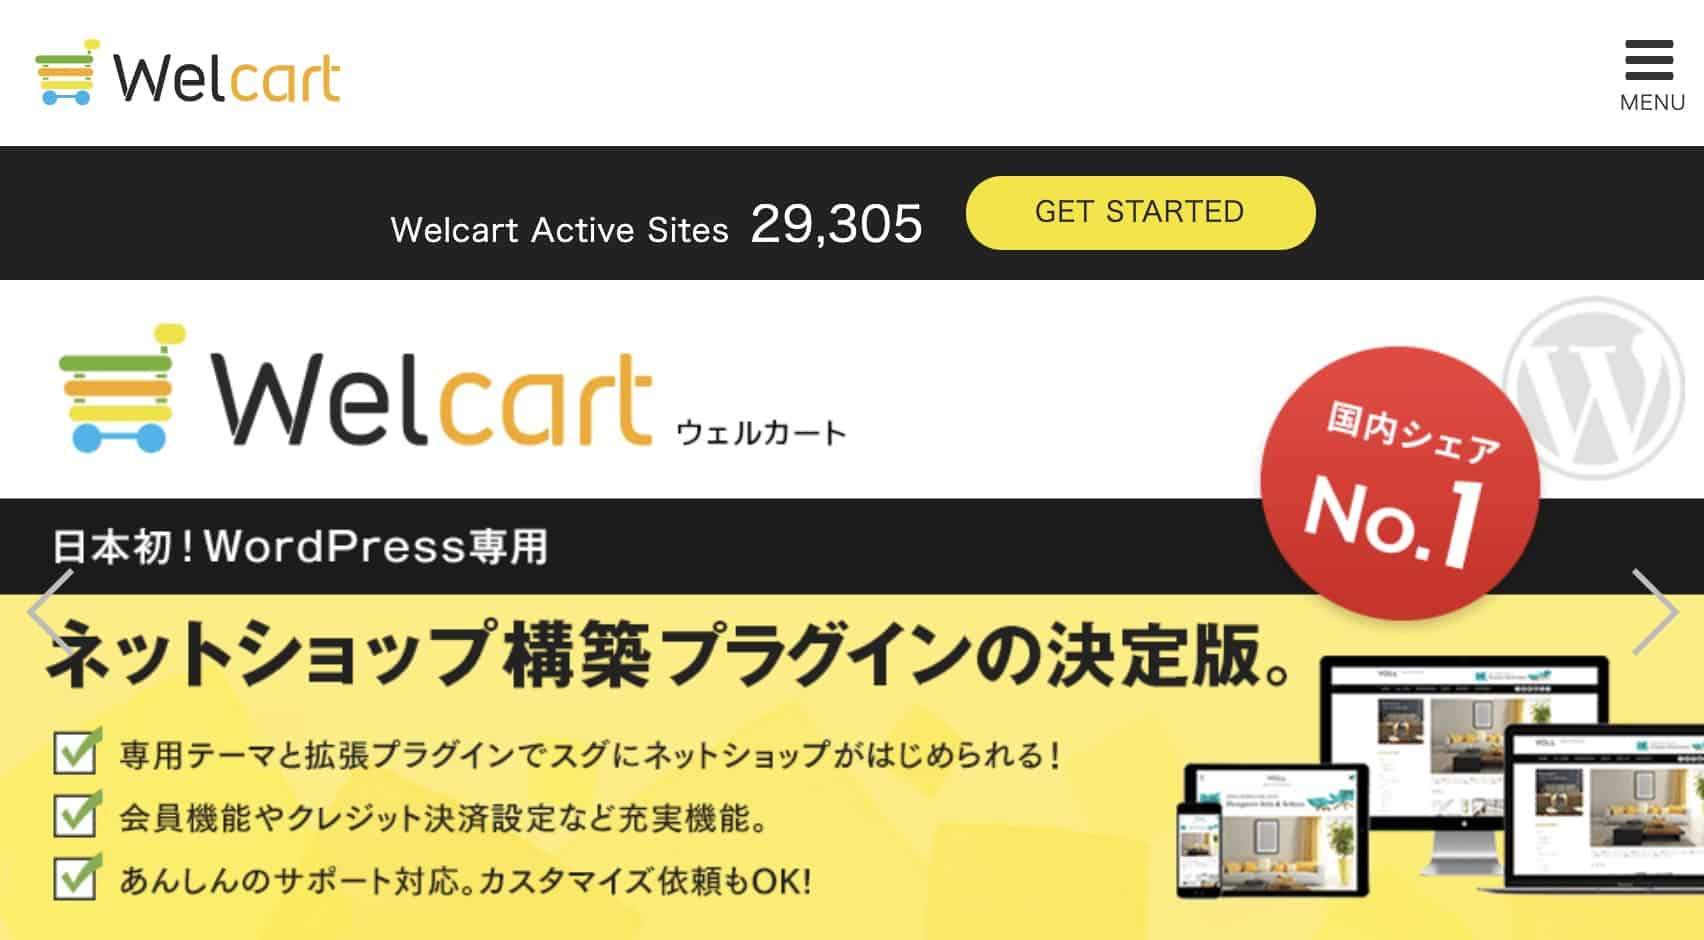 Welcart(ウェルカート)